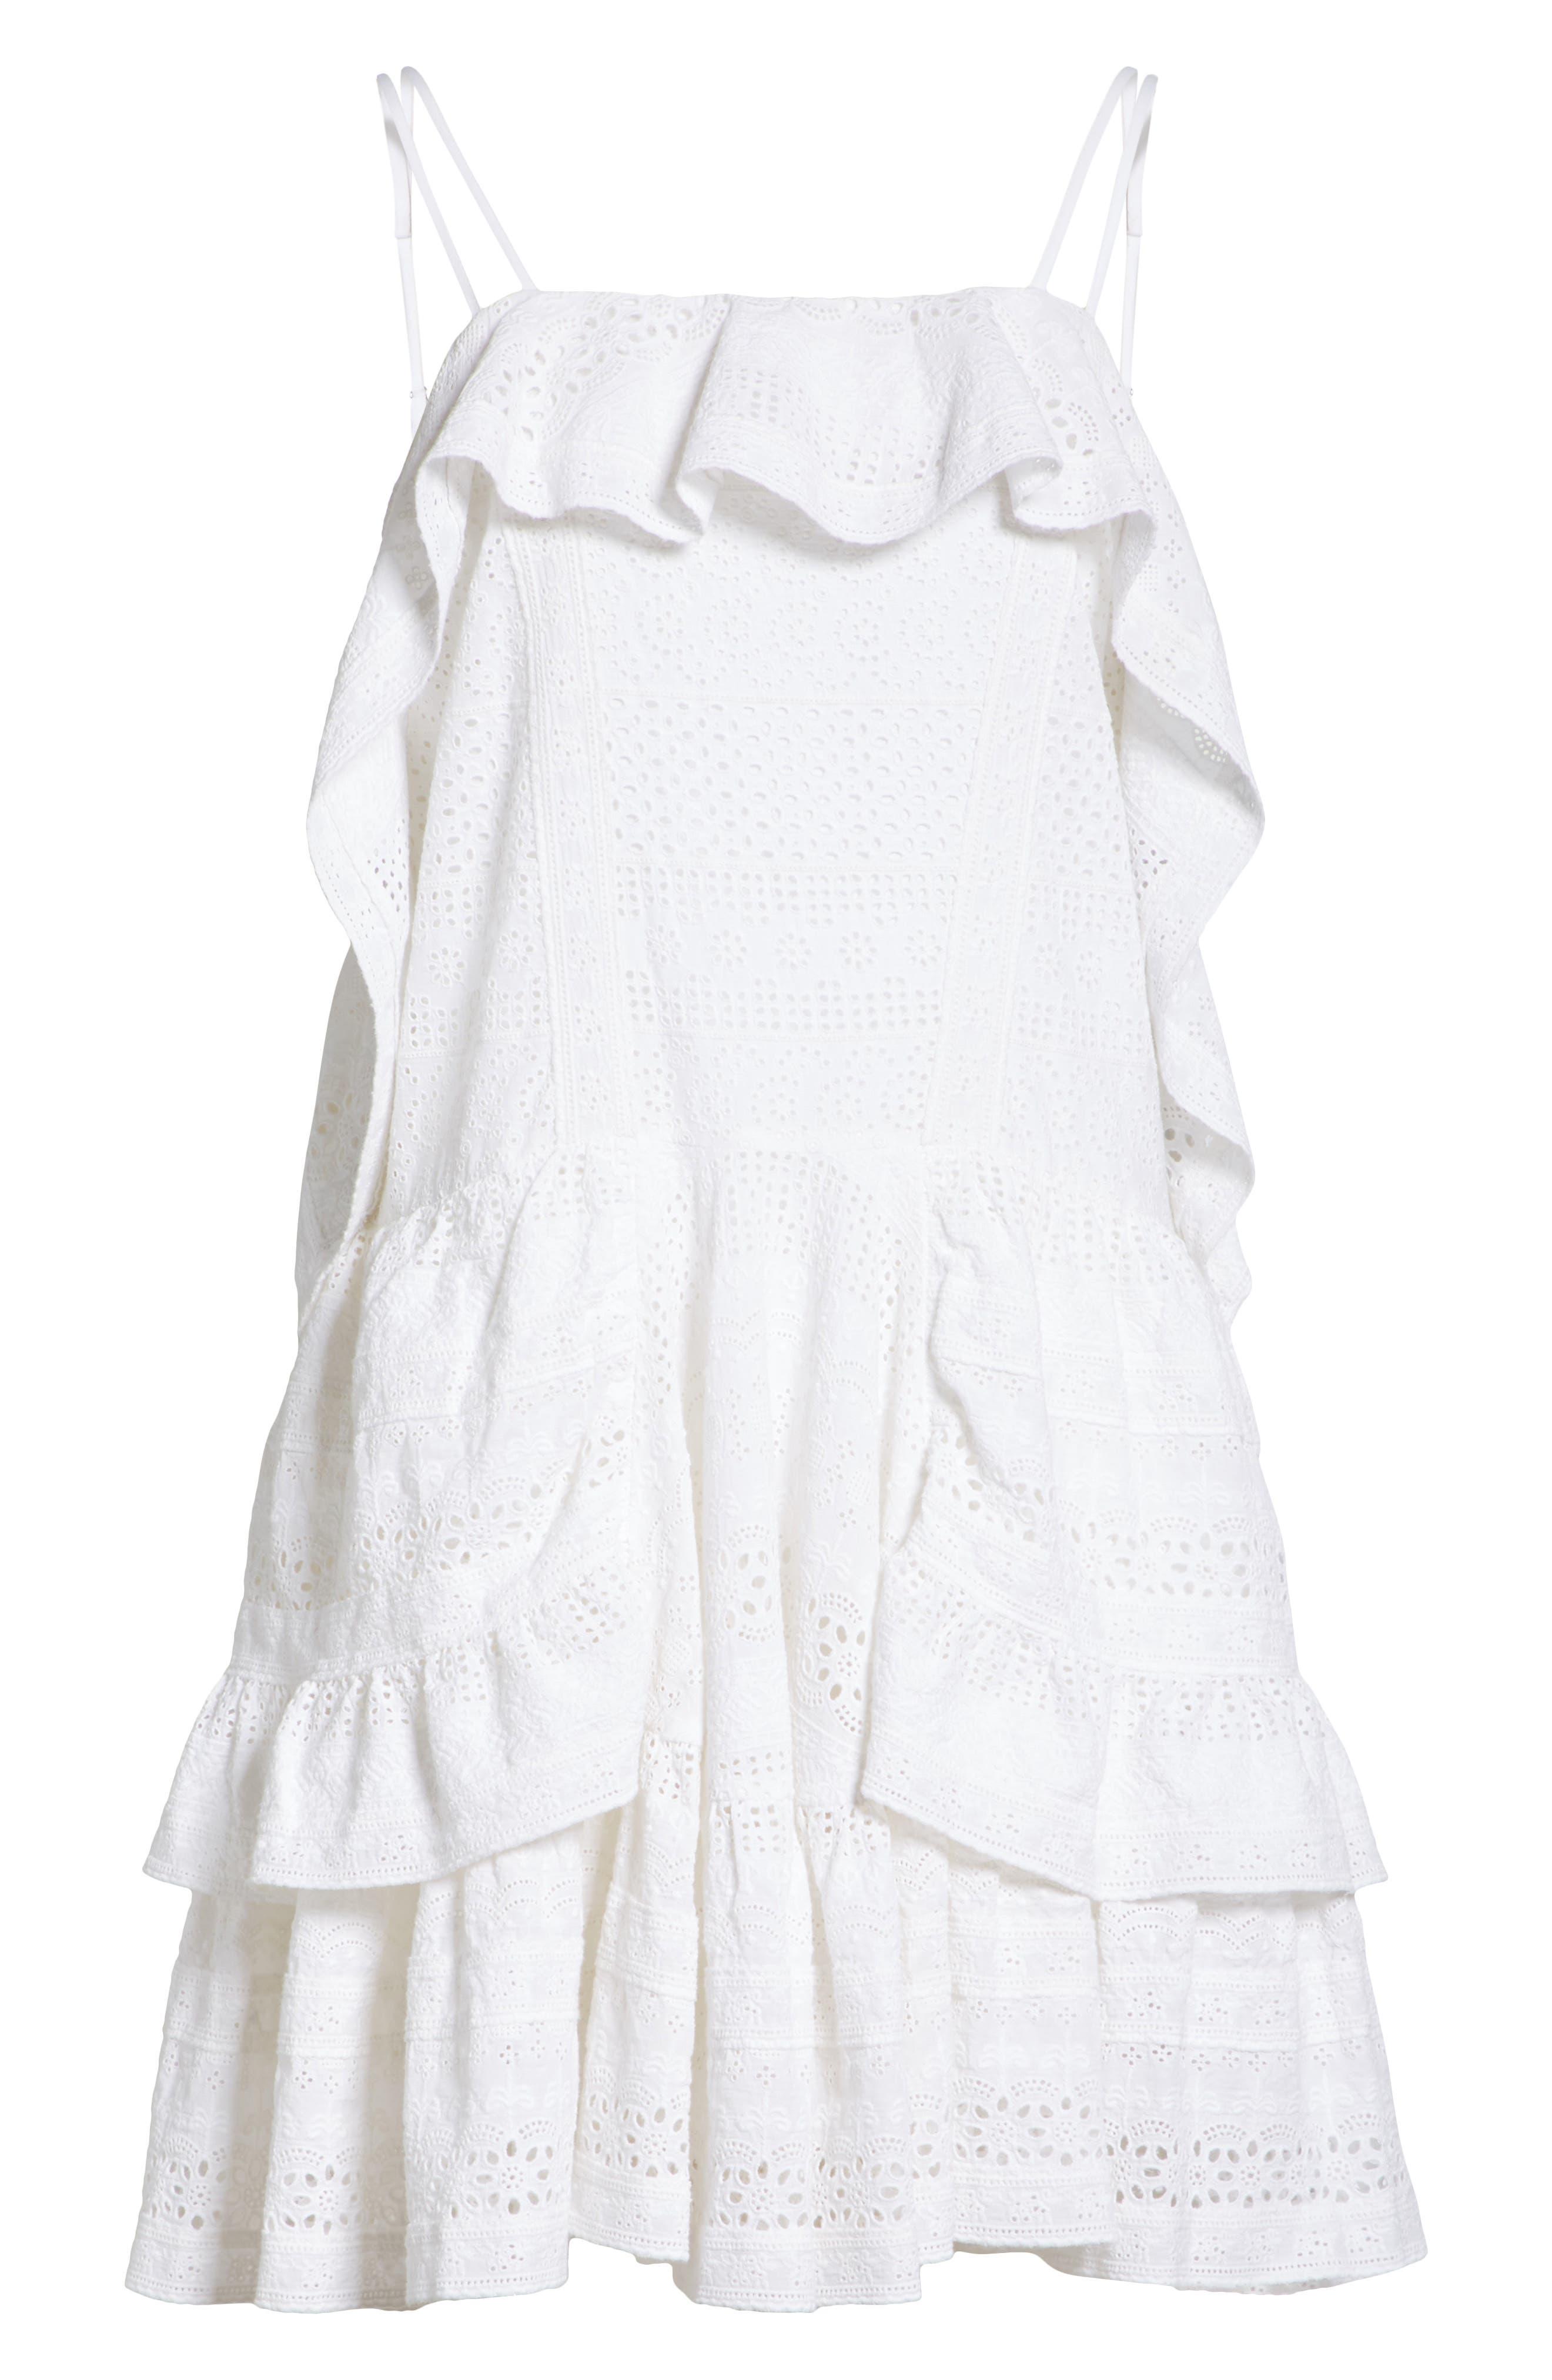 Deconstructed Broderie Dress,                             Alternate thumbnail 6, color,                             100